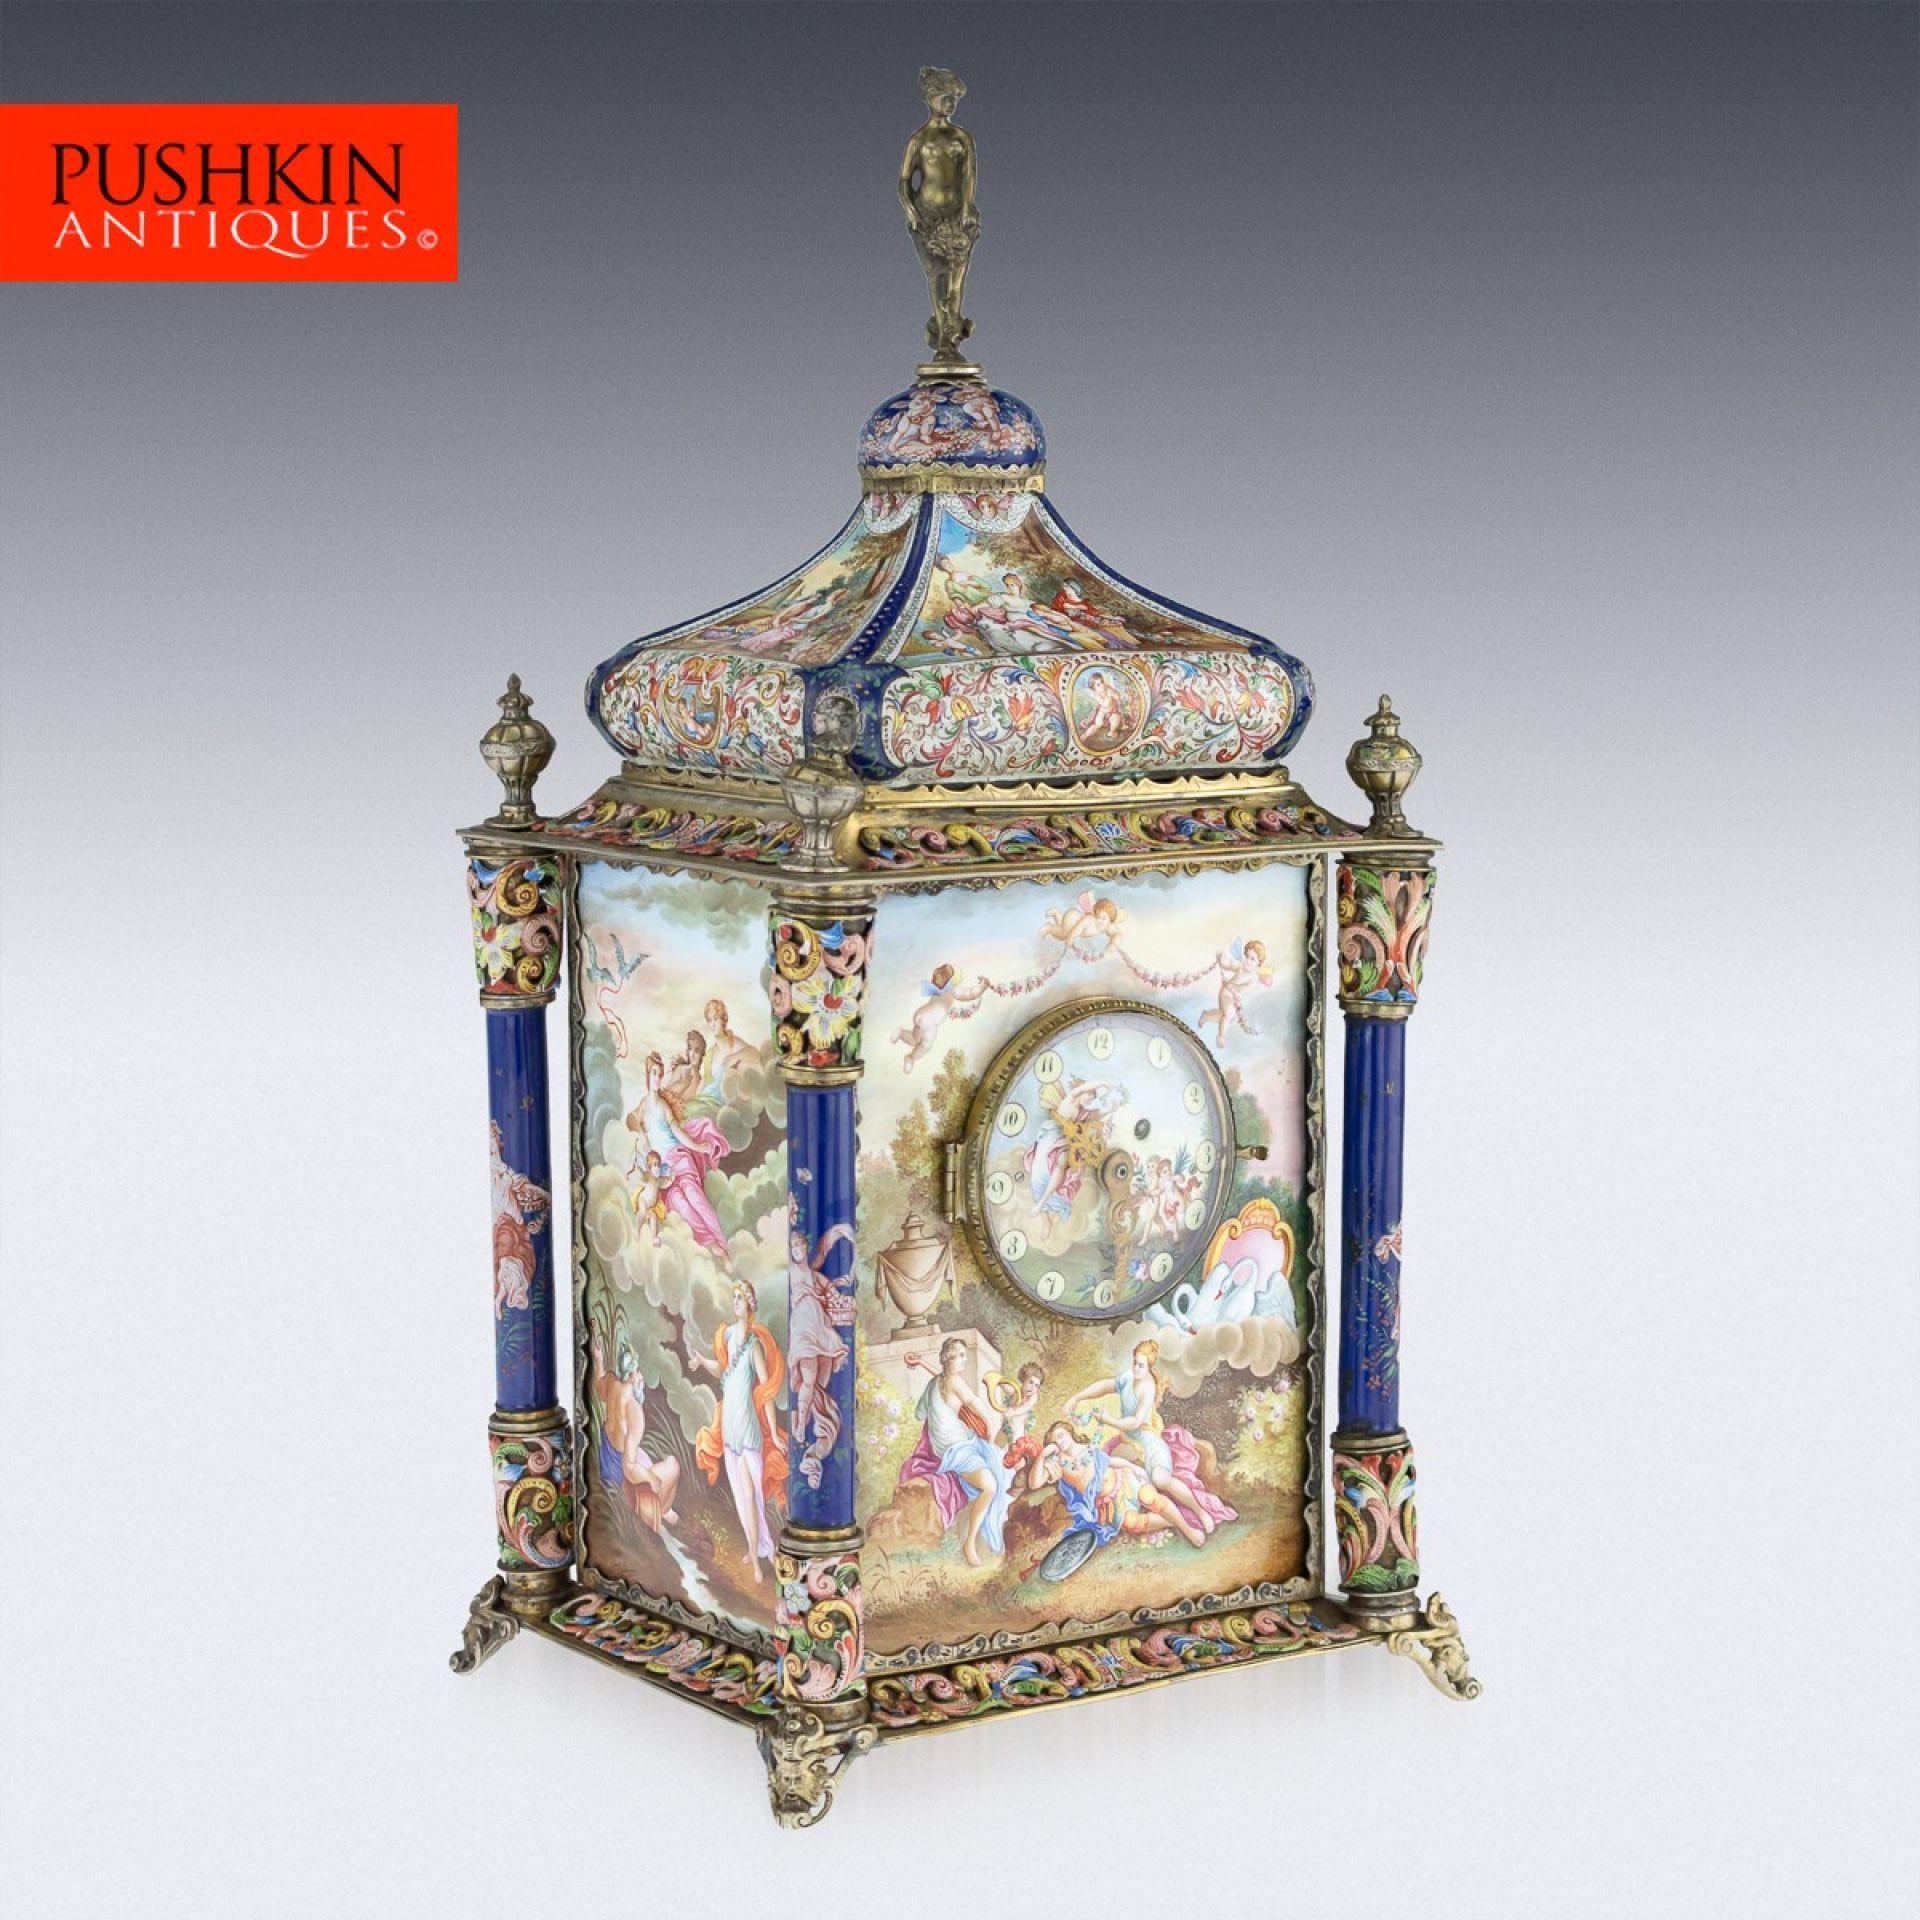 ANTIQUE 19thC AUSTRIAN SILVER-GILT & ENAMEL MANTEL CLOCK, RUDOLF LINKE c.1890